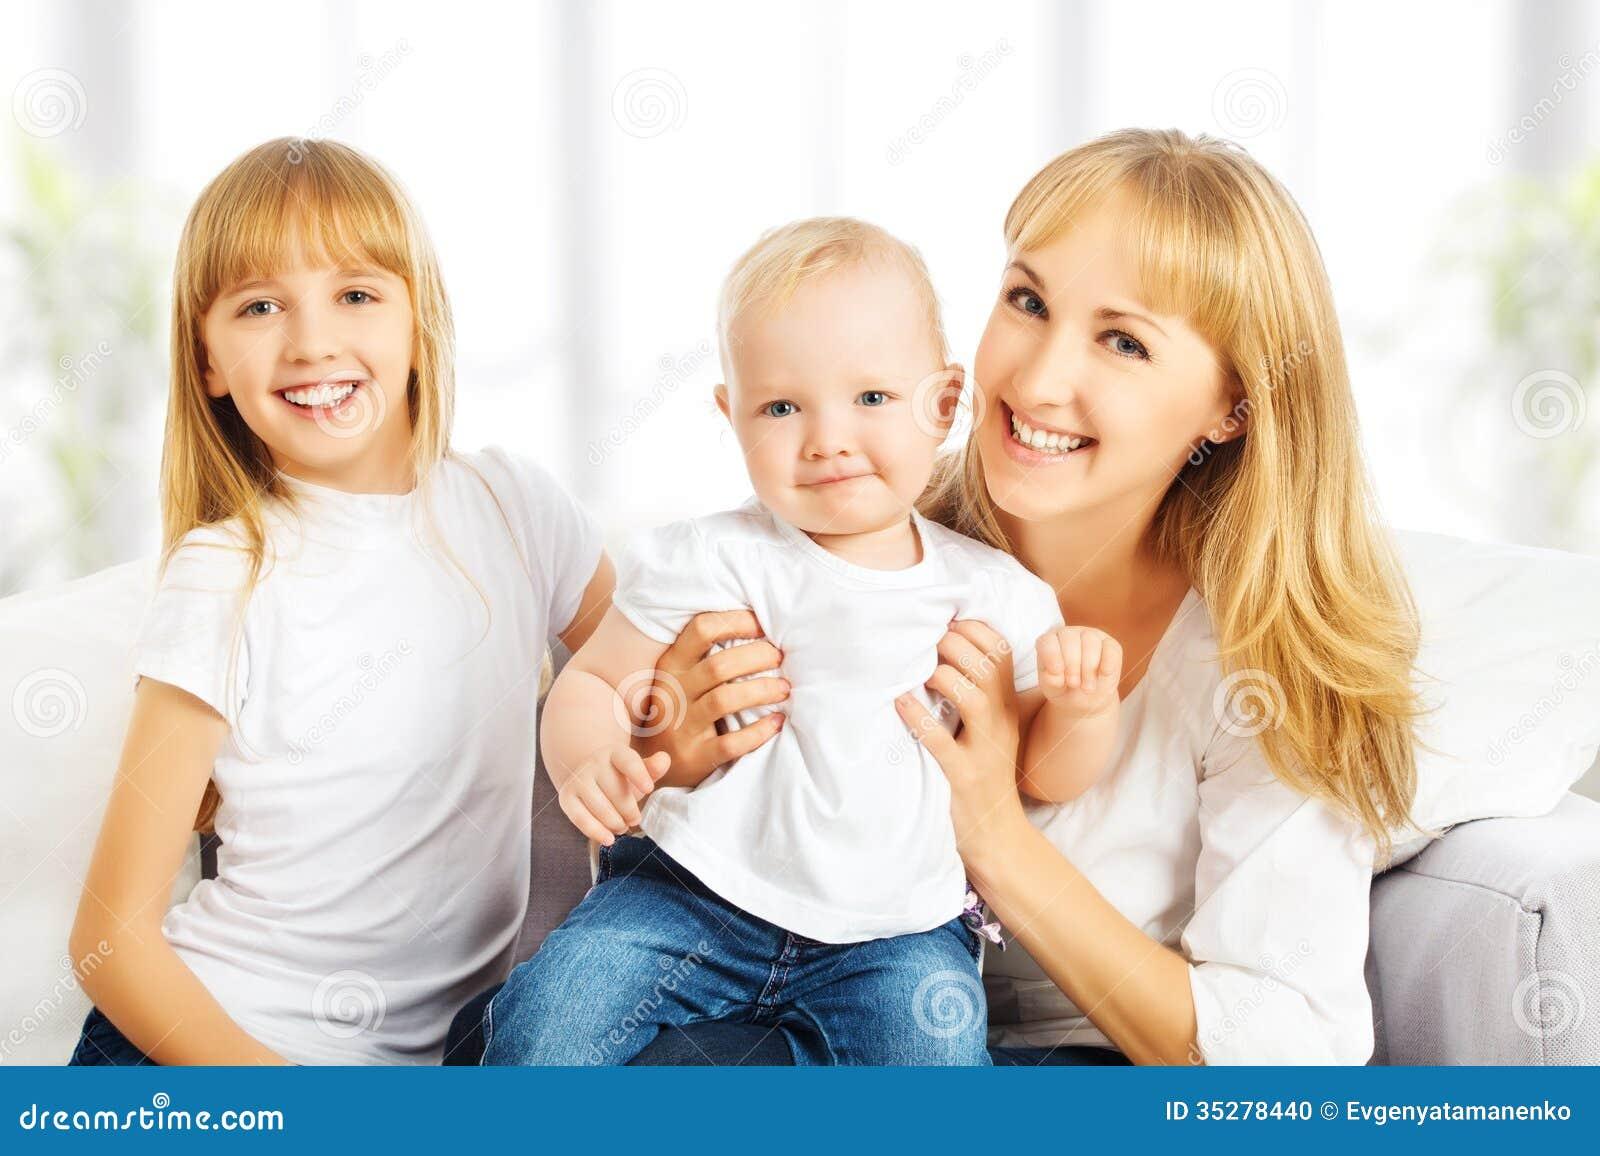 Familia feliz en casa en el sofá. Madre e hija e hijo